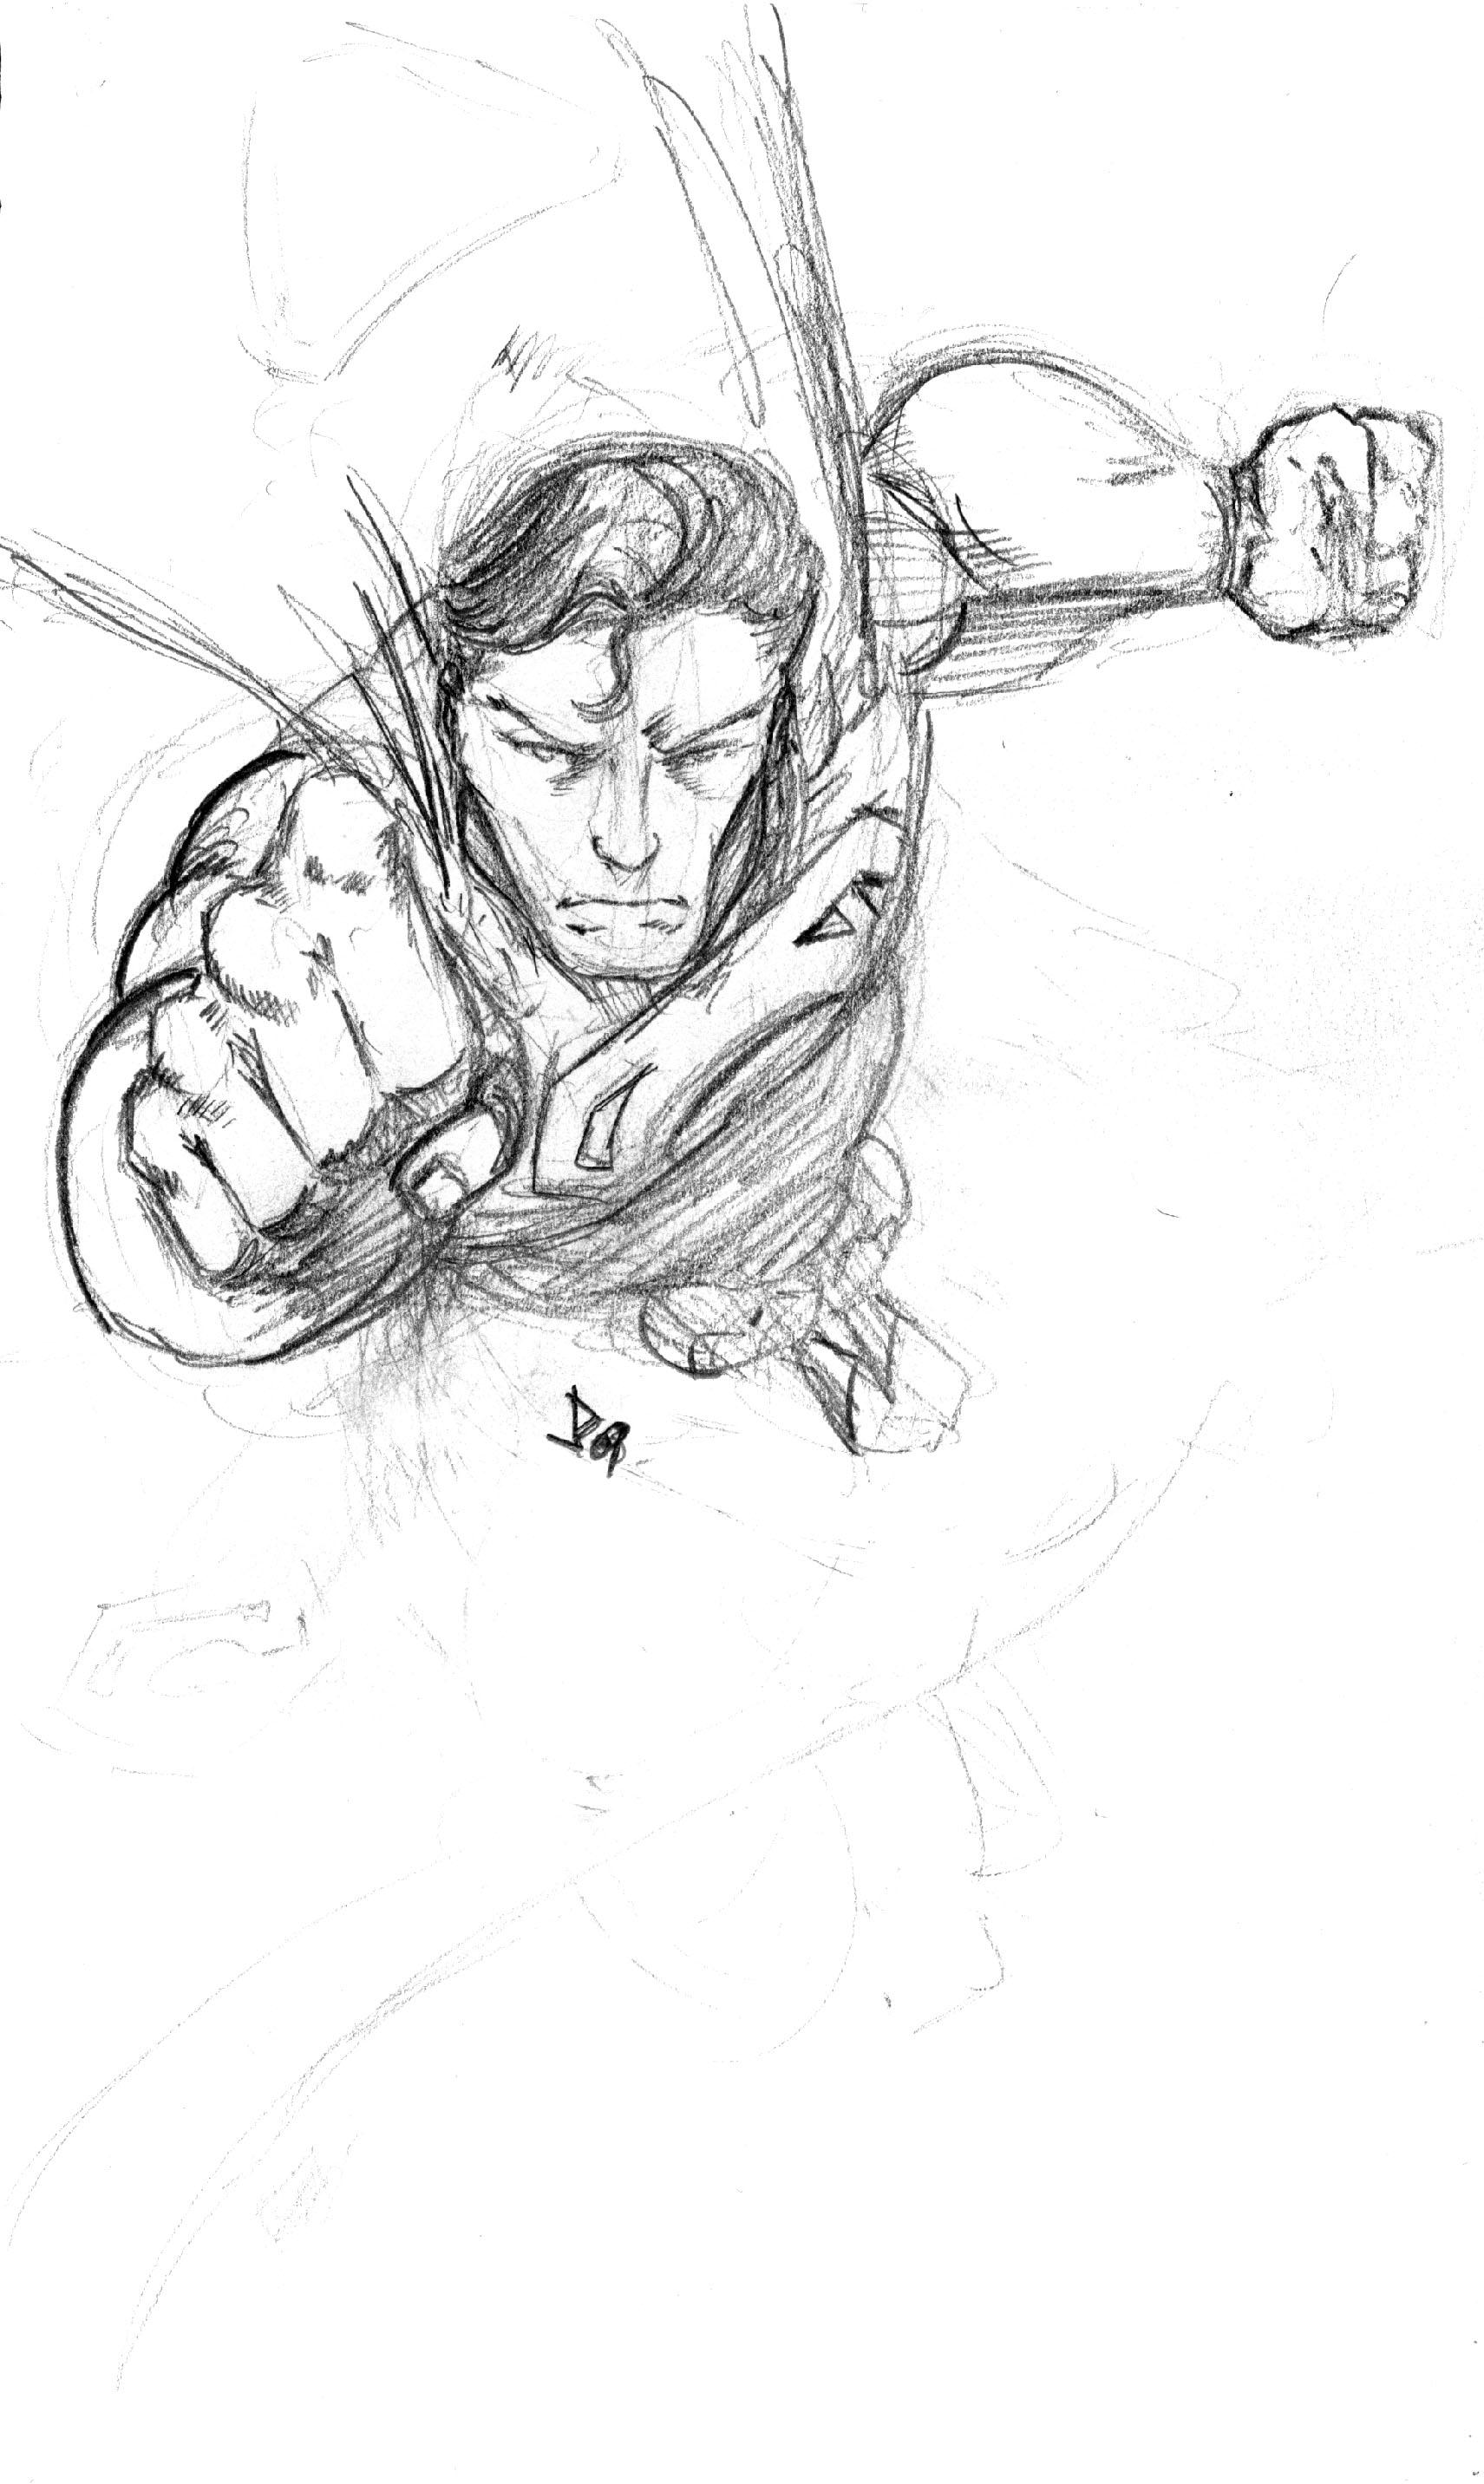 Drawn superman foreshortened Superman DC Superhero Throwdown Universe*